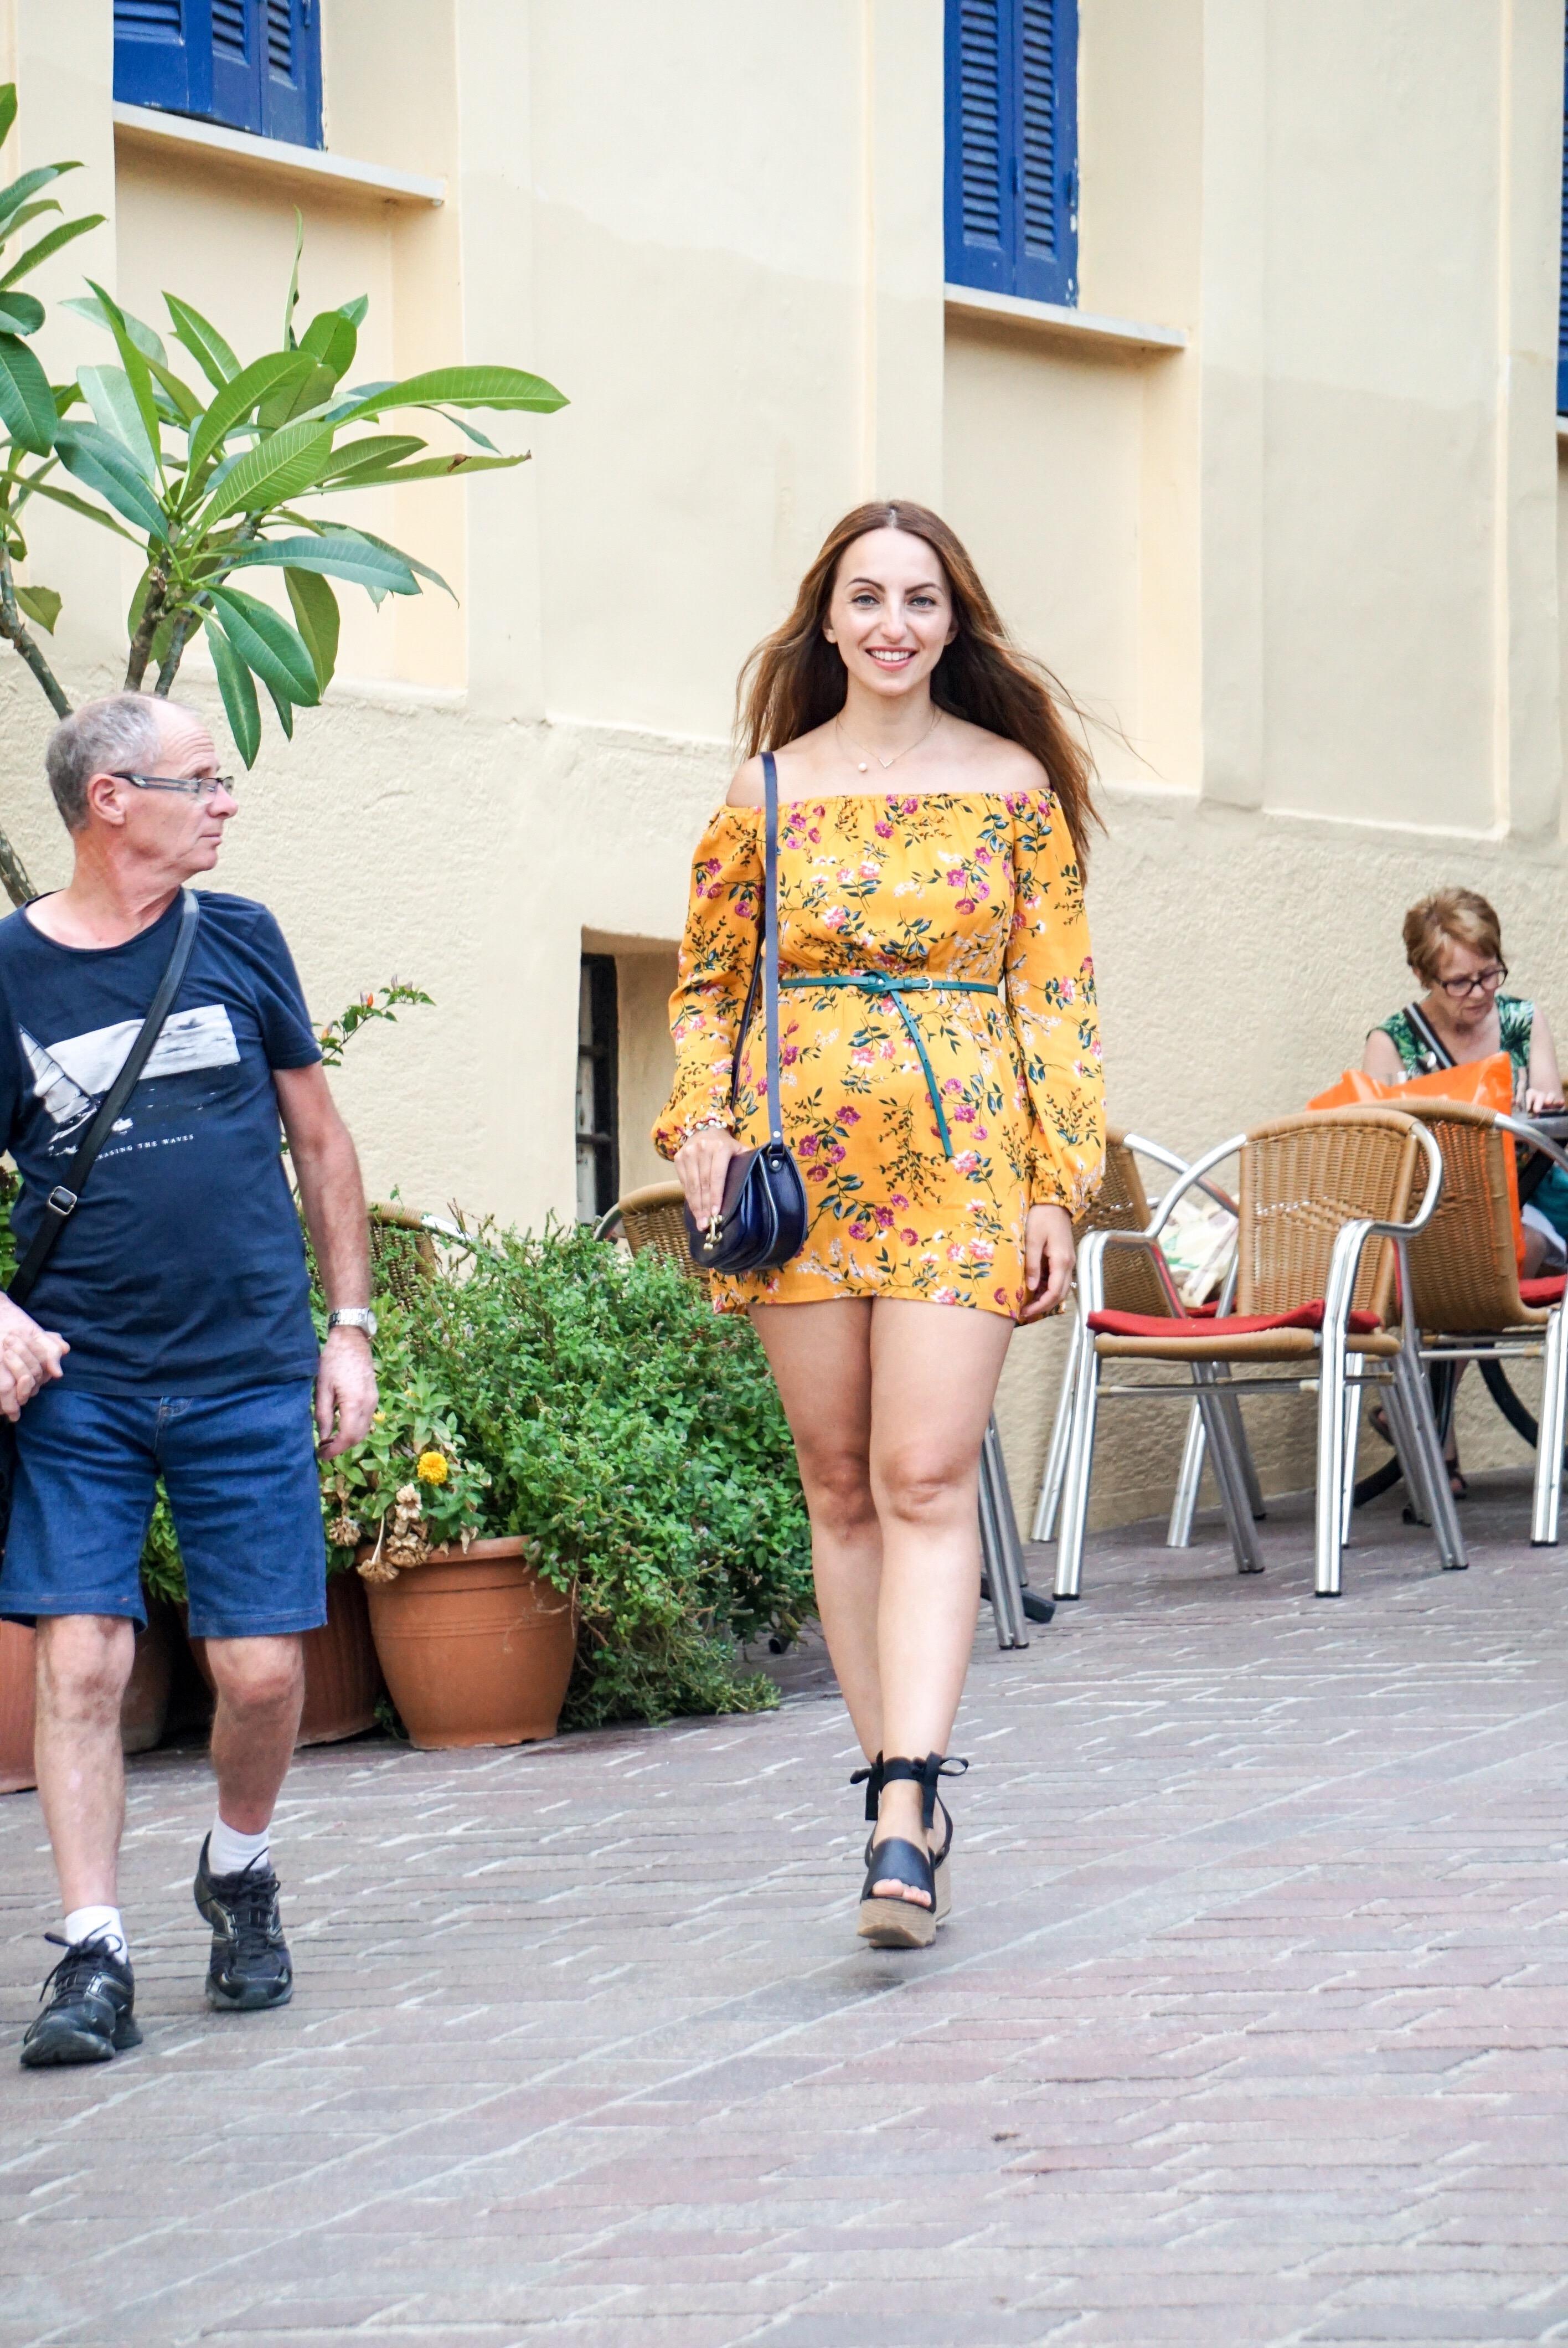 Chania-Crete-Fashionblogger-Outfit-Post-8